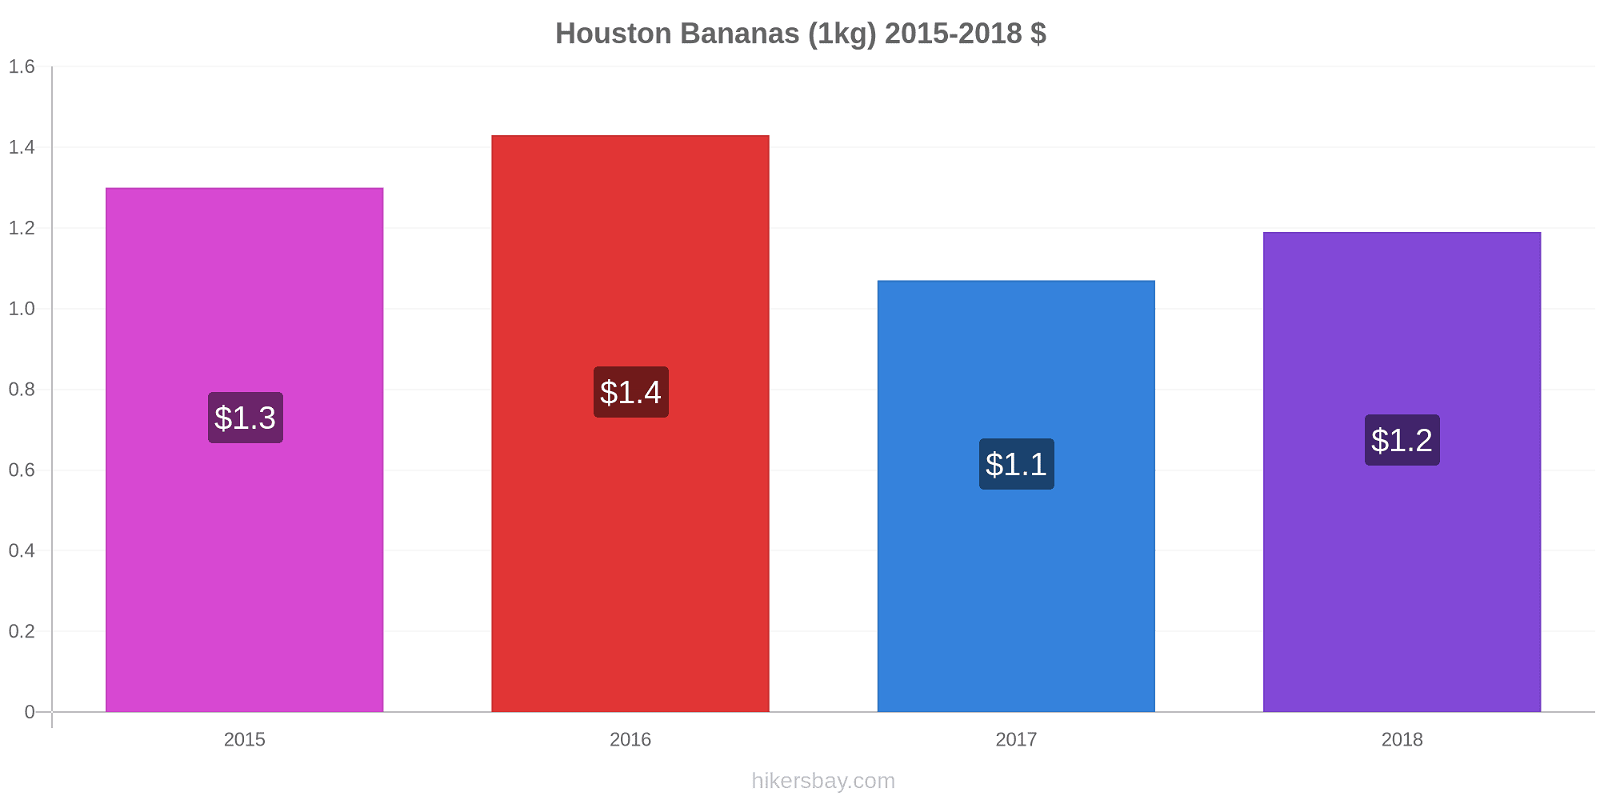 Houston price changes Bananas (1kg) hikersbay.com